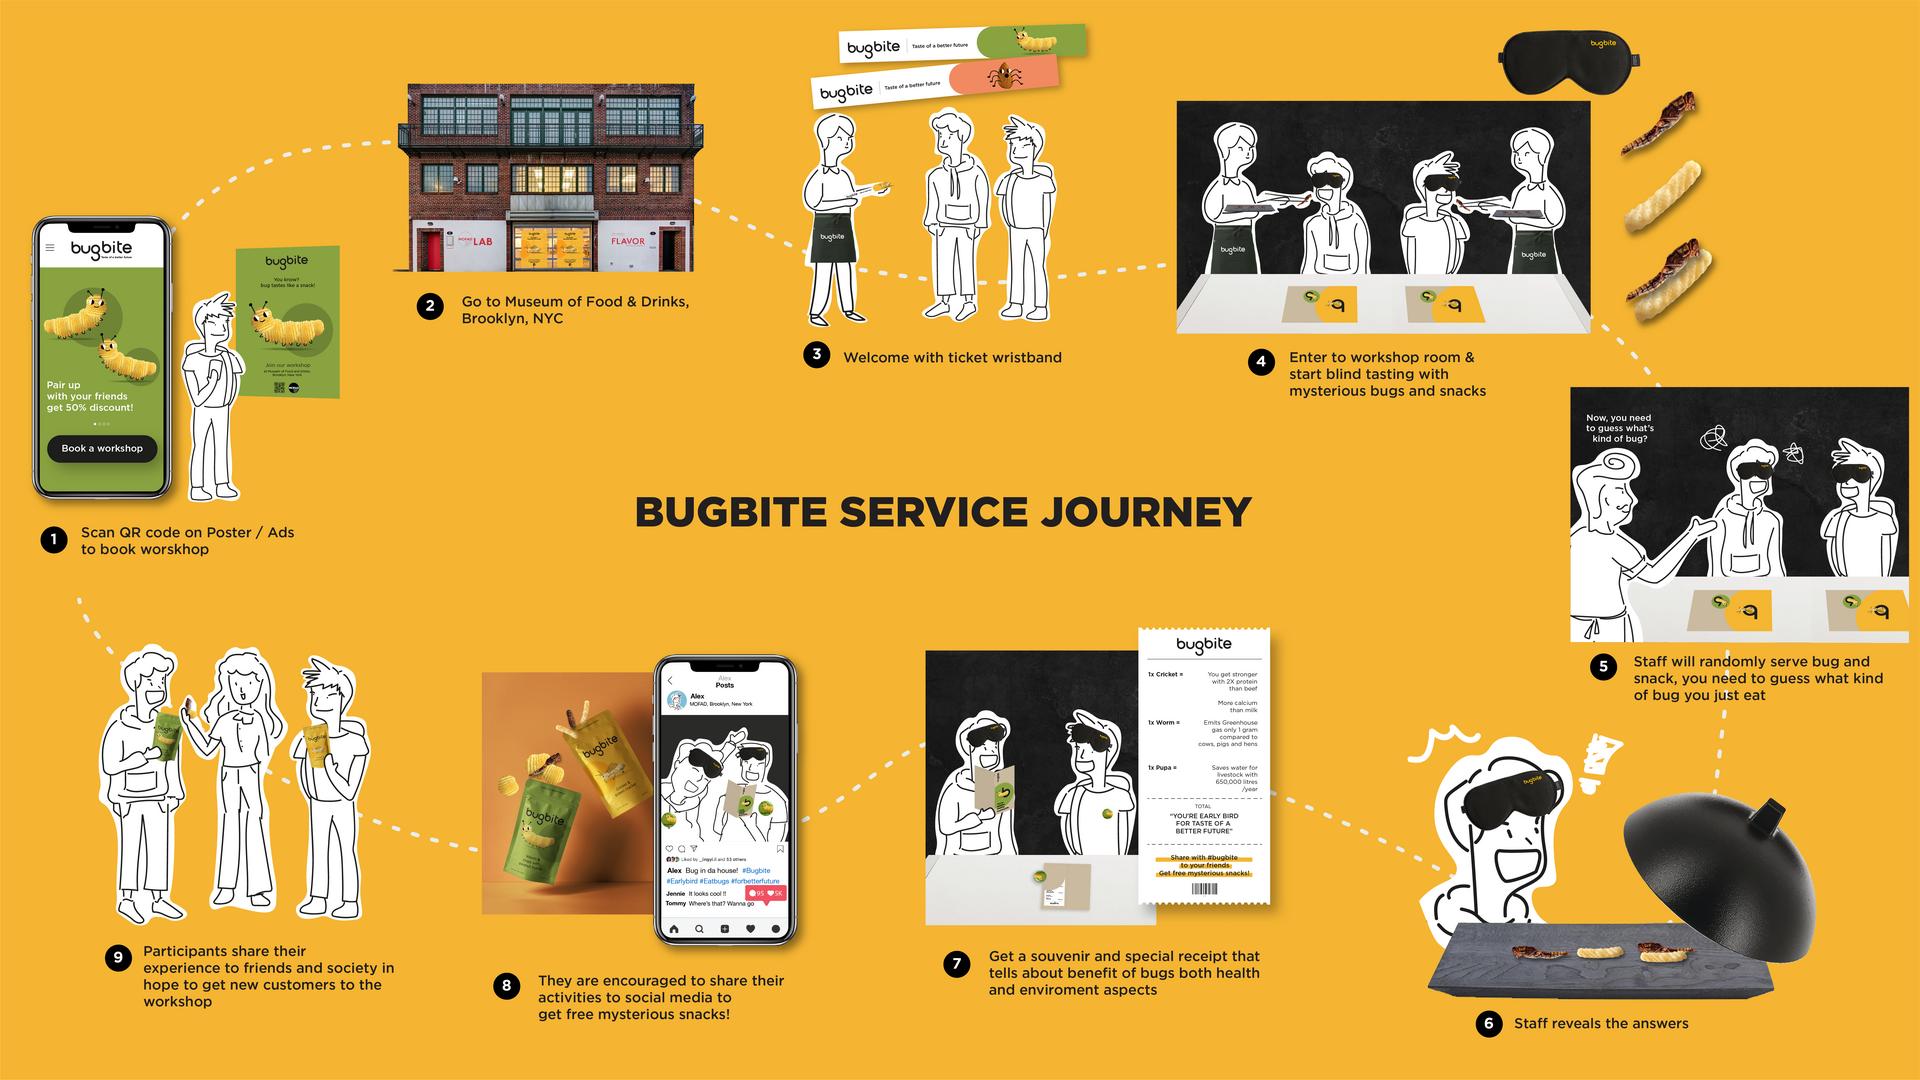 Summary of Service Journey